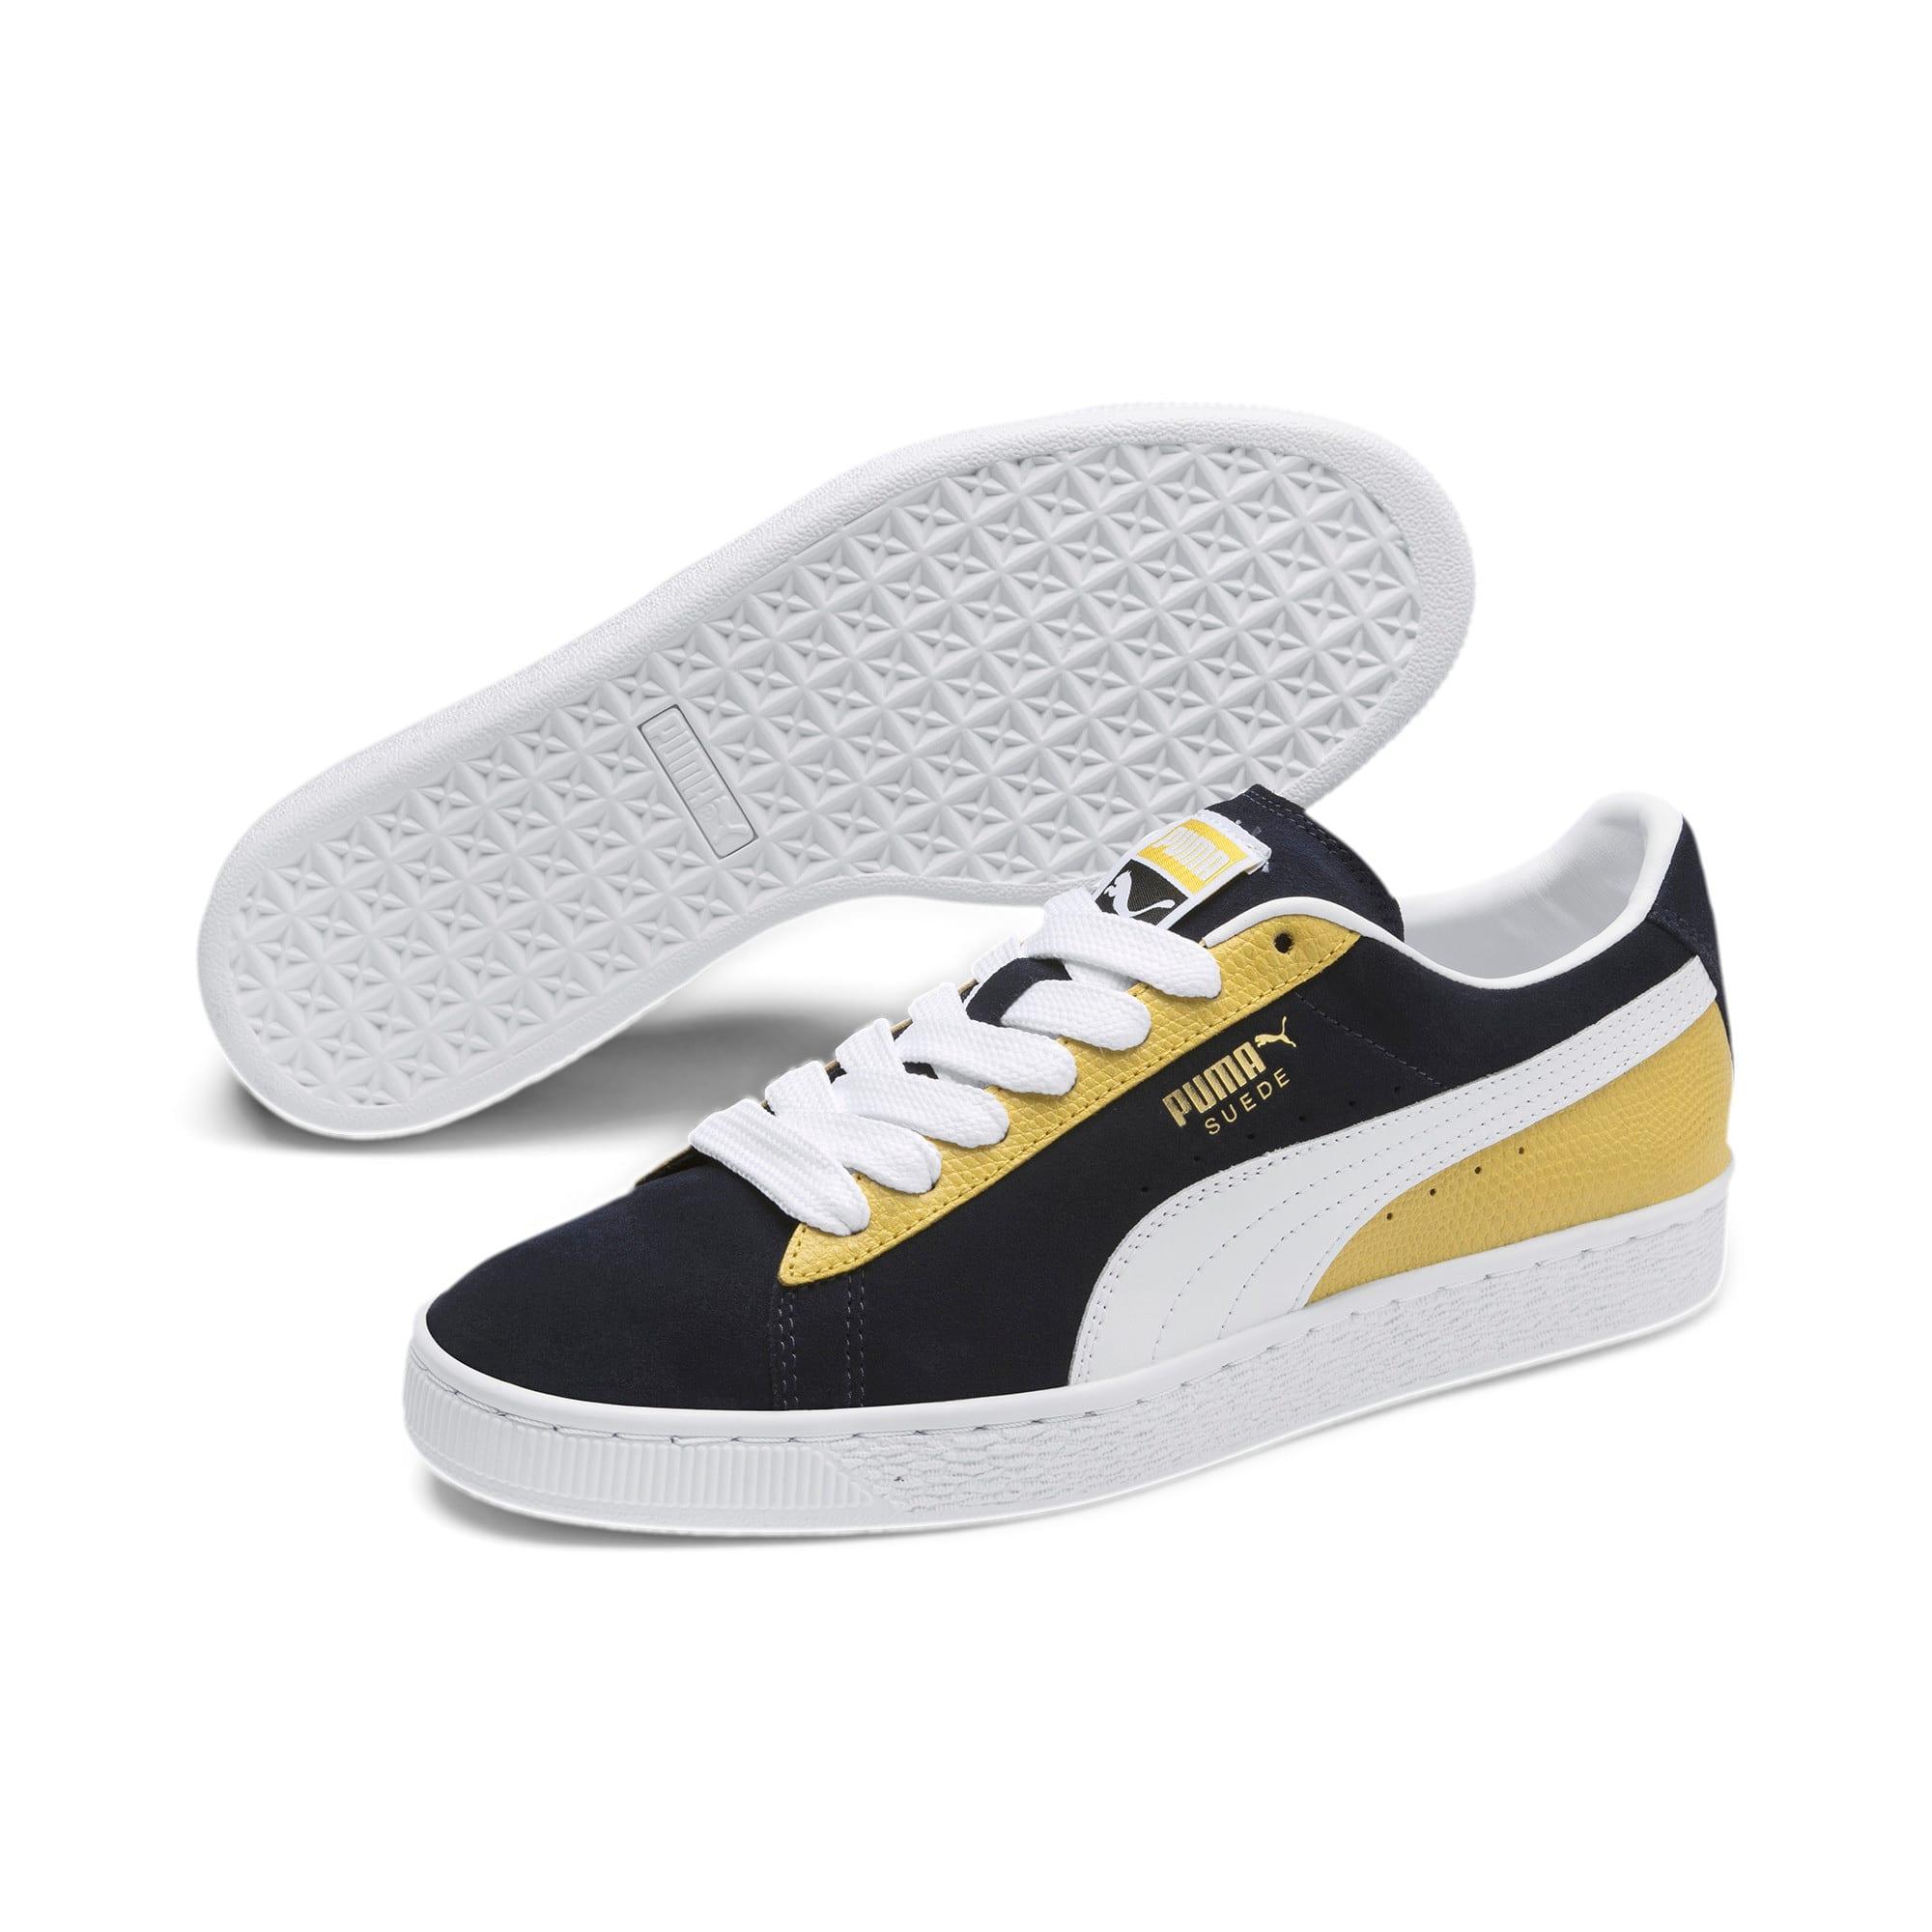 Miniatura 2 de Zapatos deportivos Suede Classic Block, Peacoat-Sulphur-Puma White, mediano